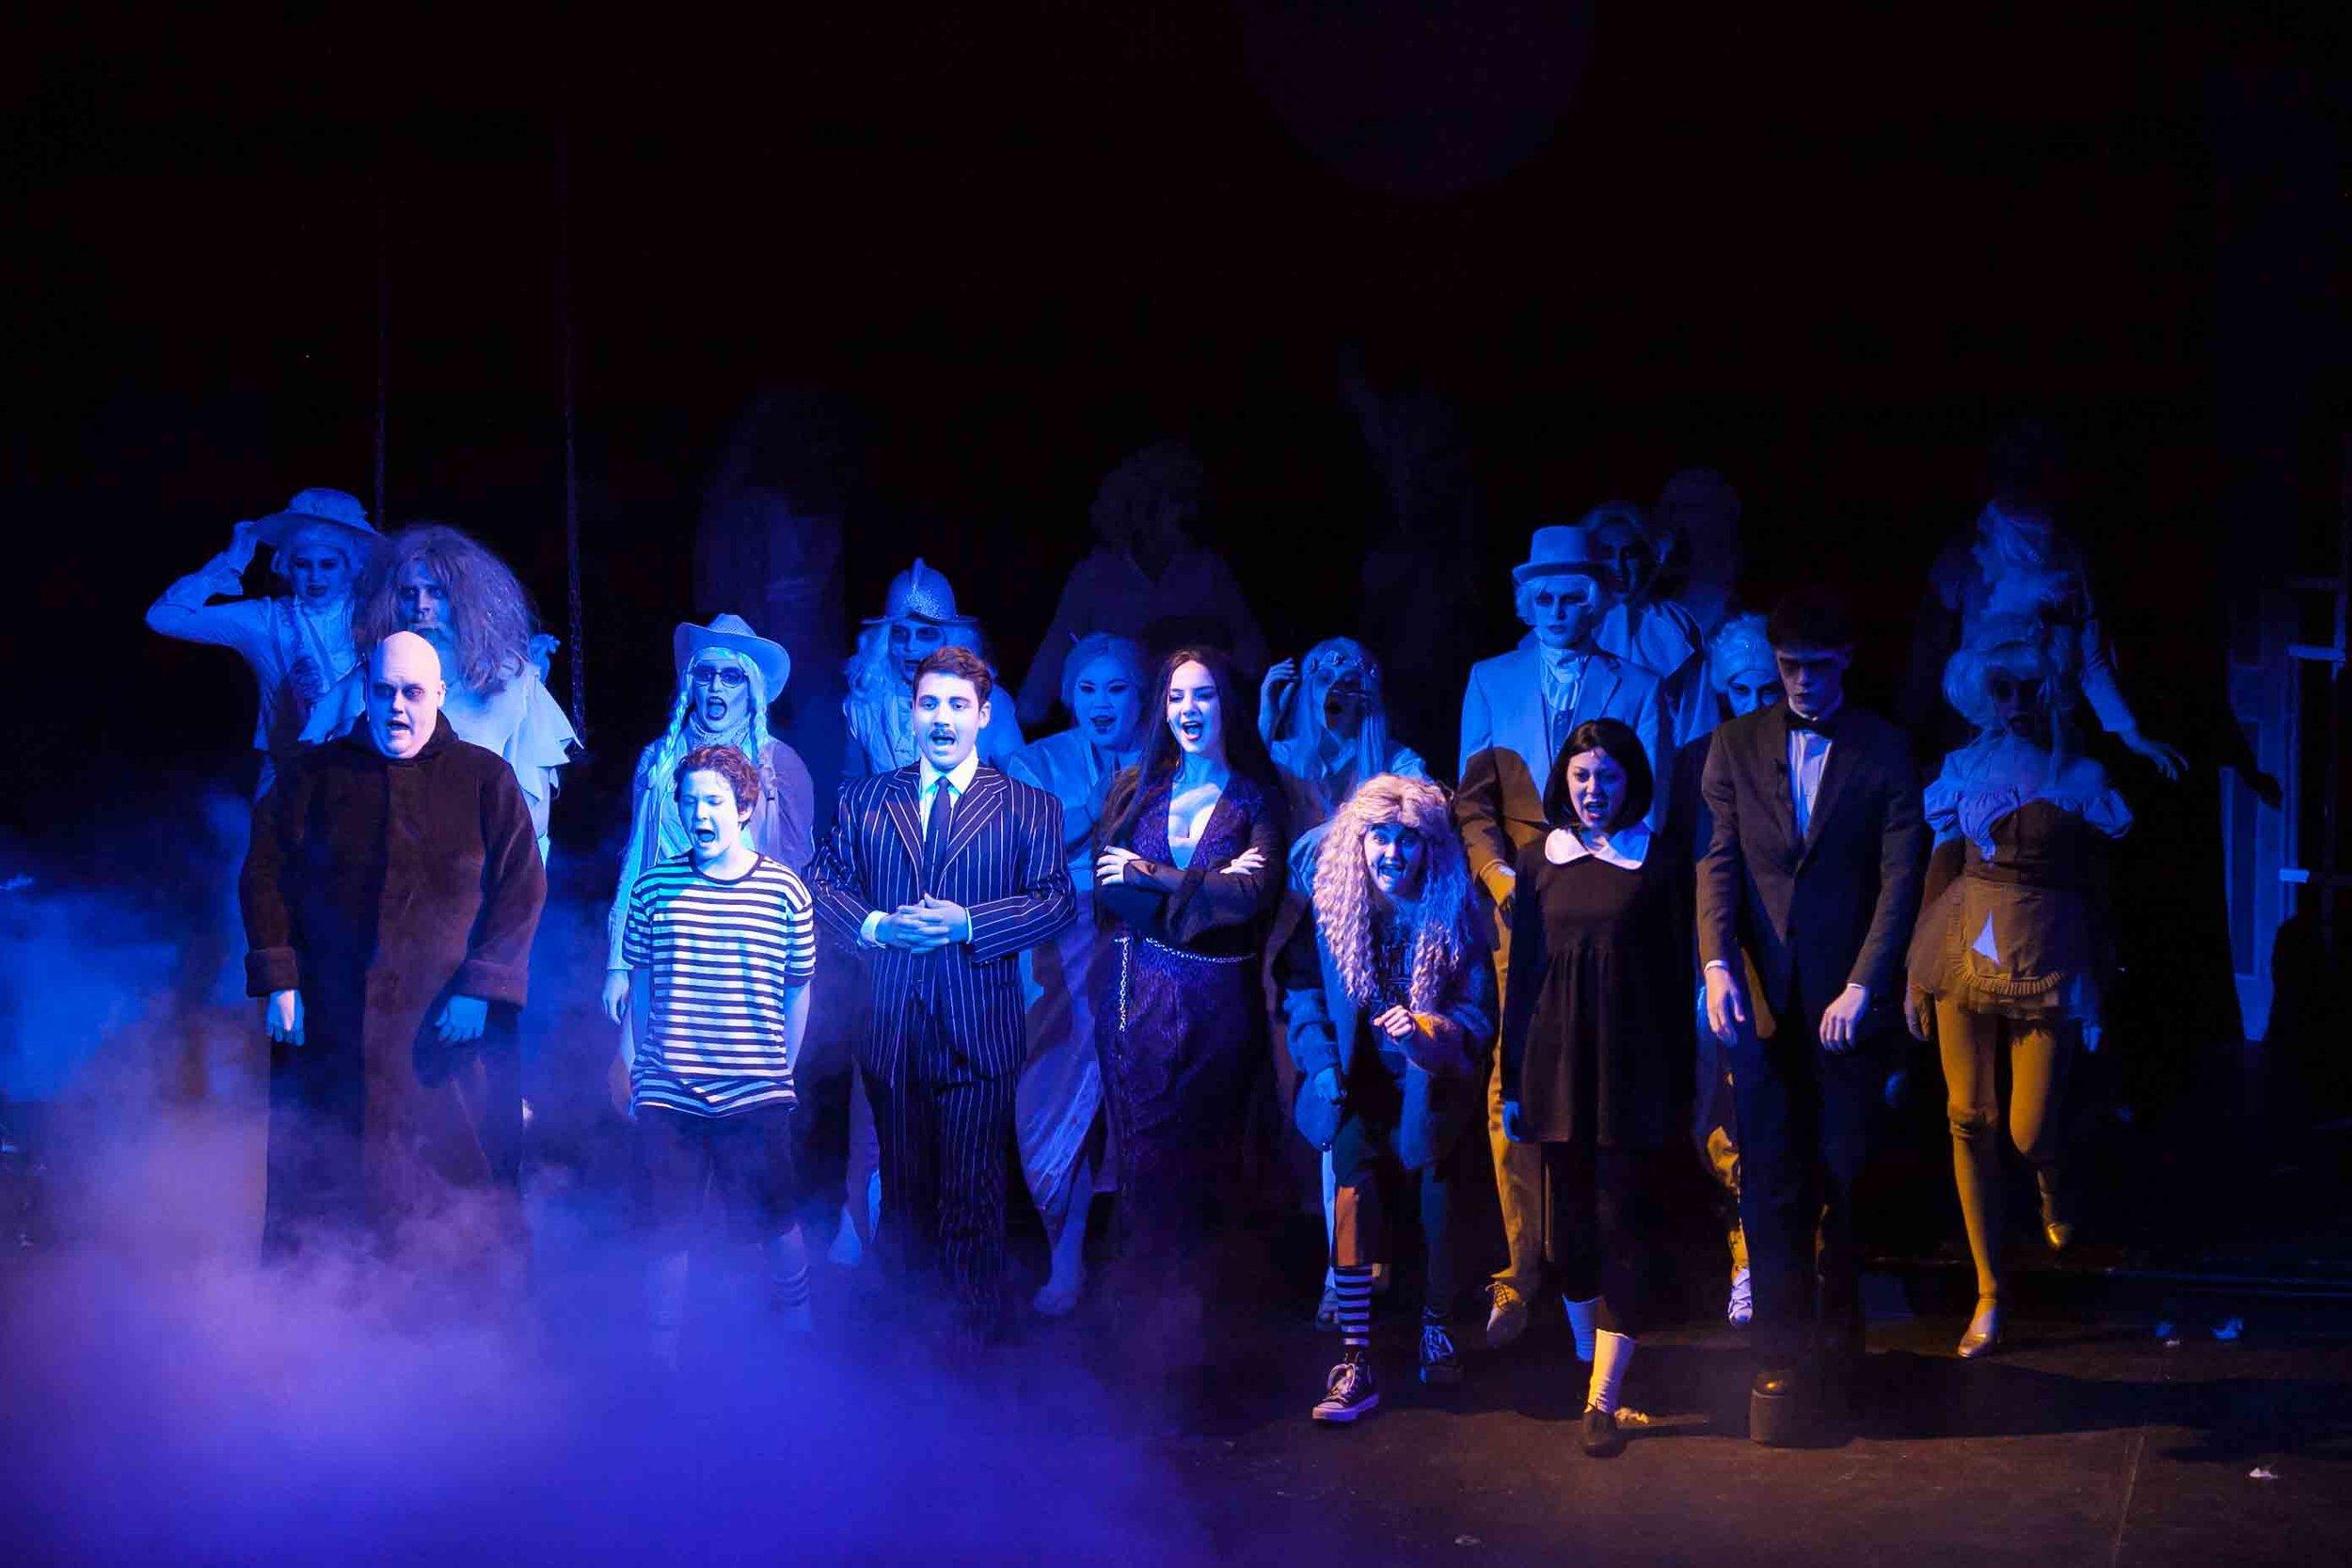 6-19-16 Addams Family Creepy Cast 0053.jpg